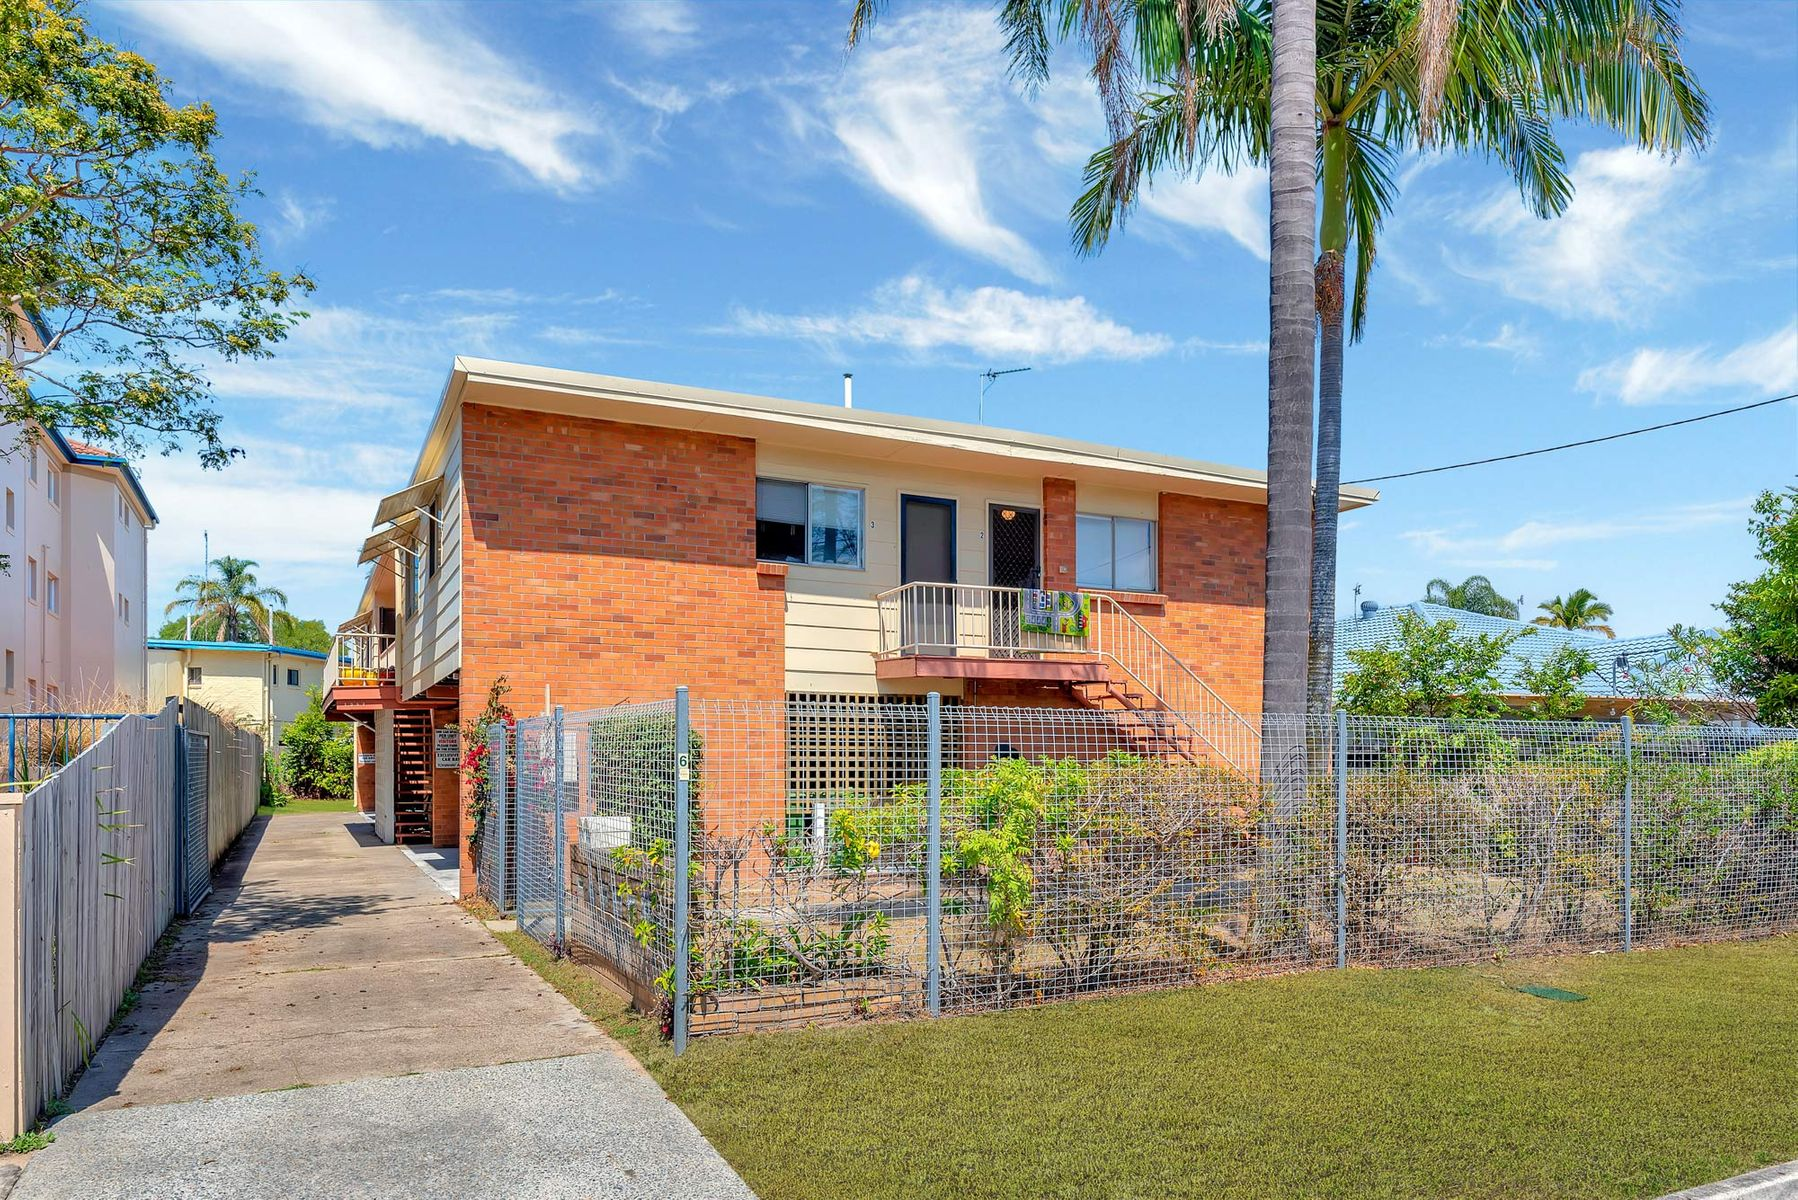 7/6 Adori Street, Chevron Island, QLD 4217